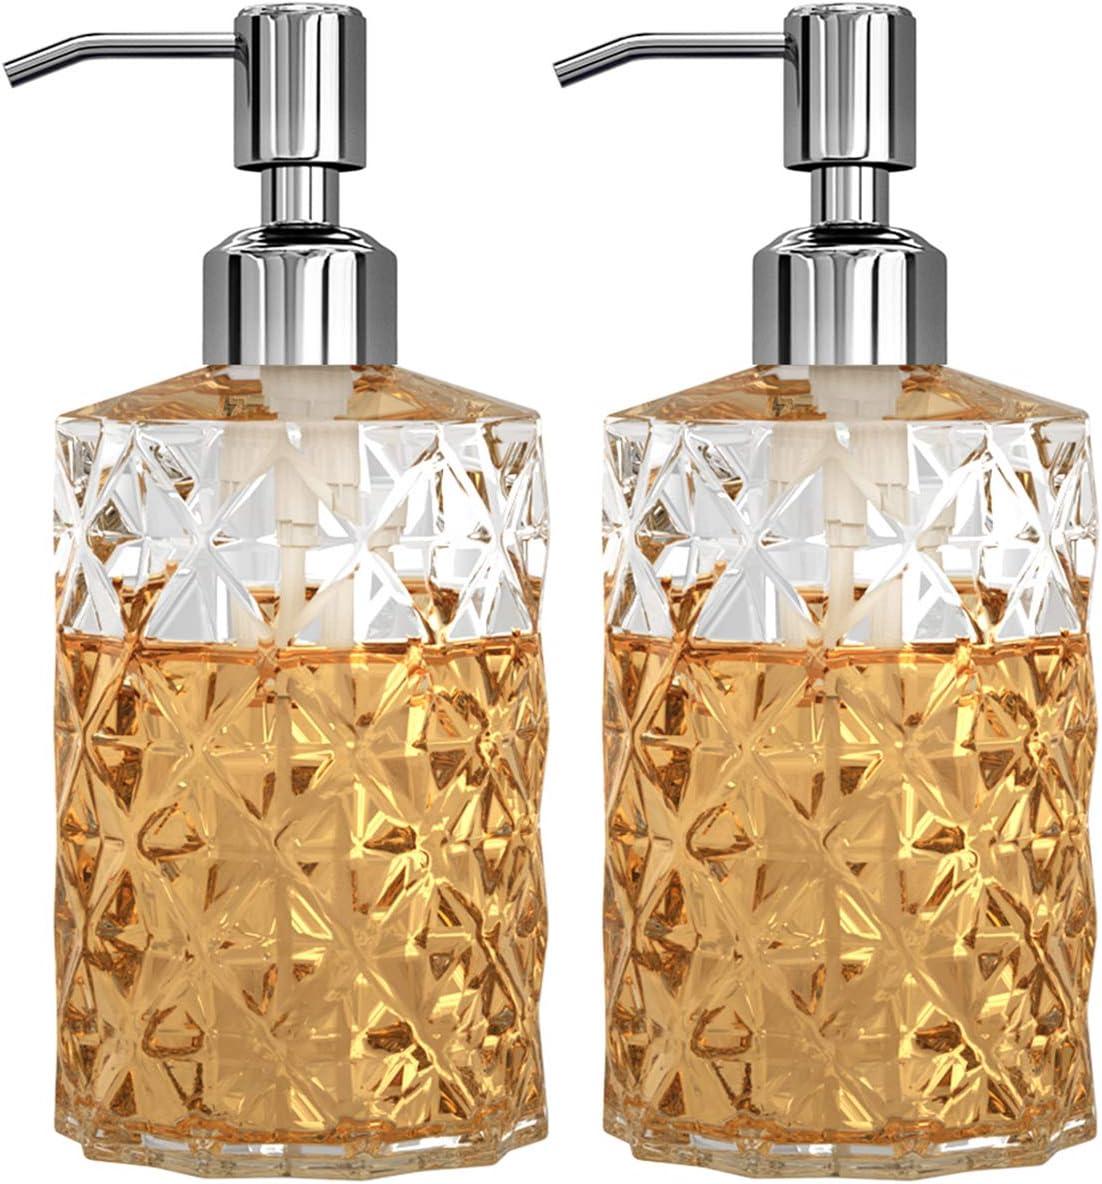 GLADPURE Soap Dispenser - 2 Pack Diamond Clear Design 12 Latest item Popular shop is the lowest price challenge Oz Gla